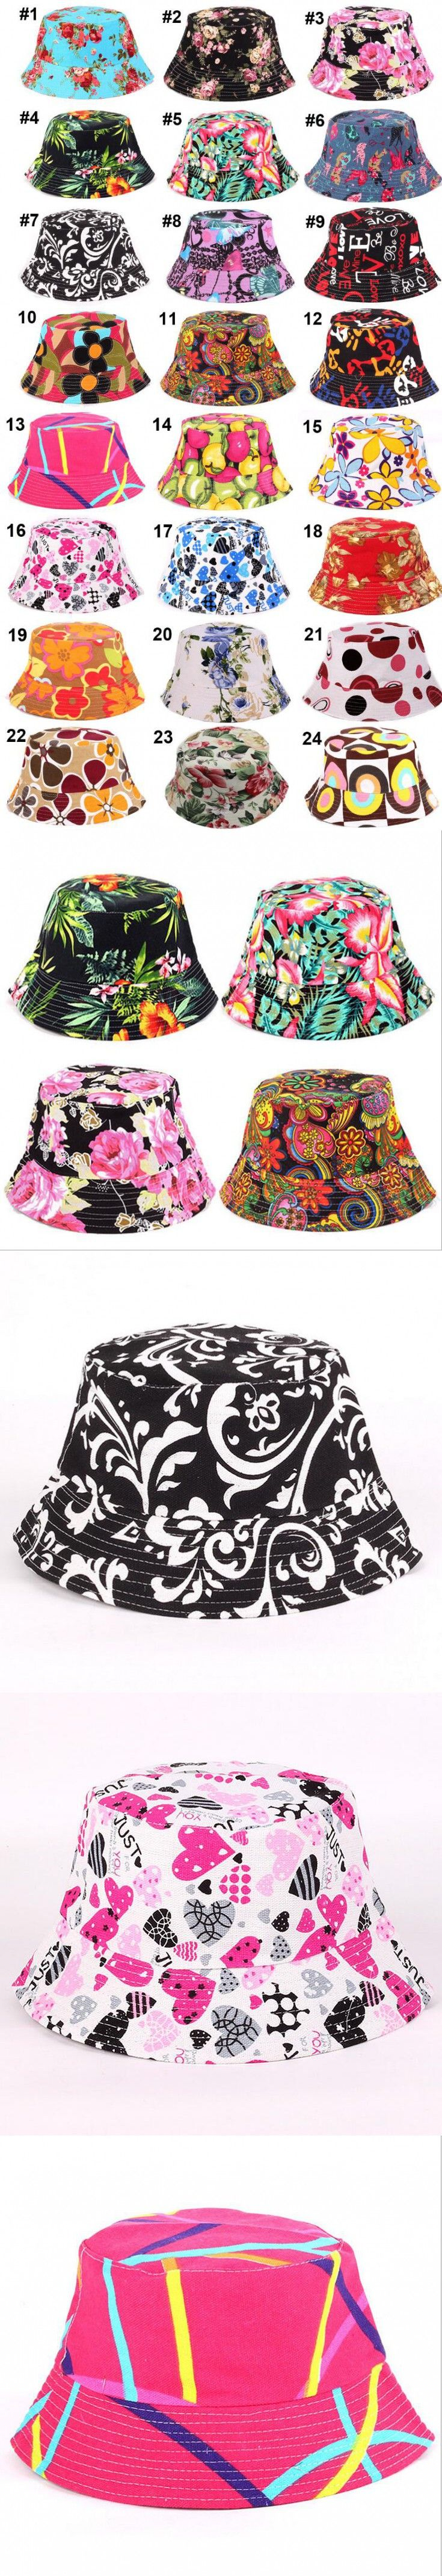 27 desings Fashion Women Sports Bucket Hats print flower sun hat cap outdoor travel hat fishing cap mountaineering sunscreen cap $18.5